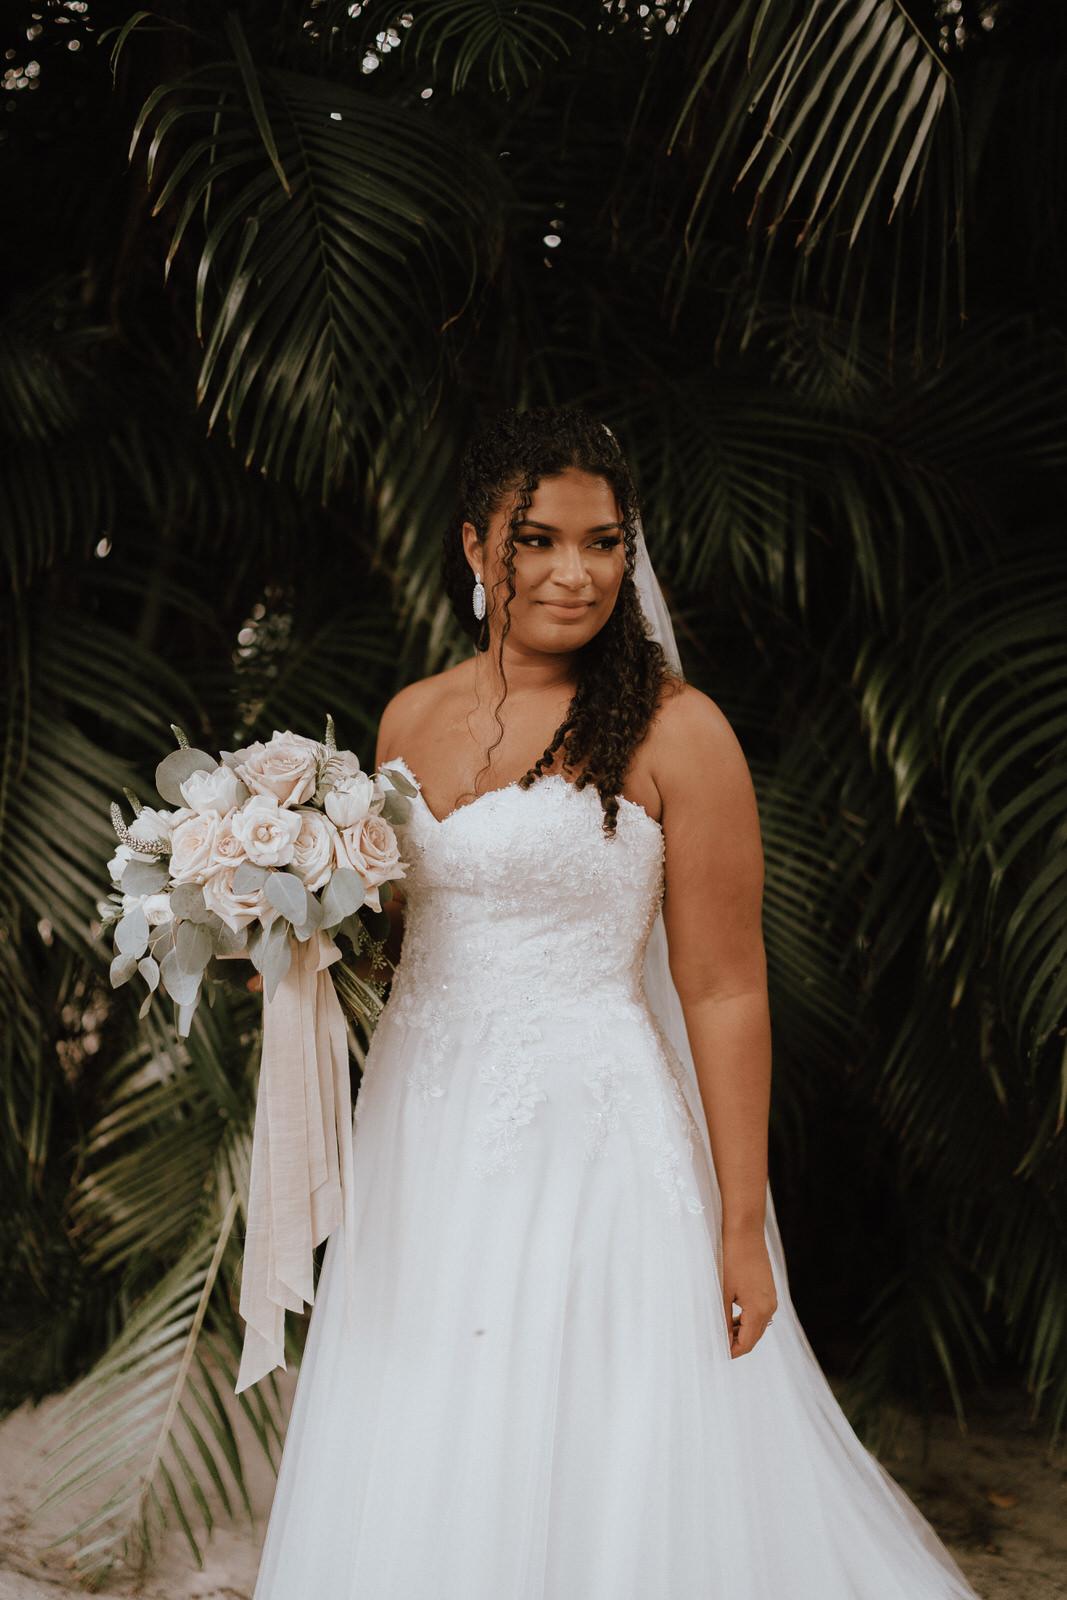 South Seas Island Resort Elopement- Alyana and Shawn- Michelle Gonzalez Photography-131.JPG